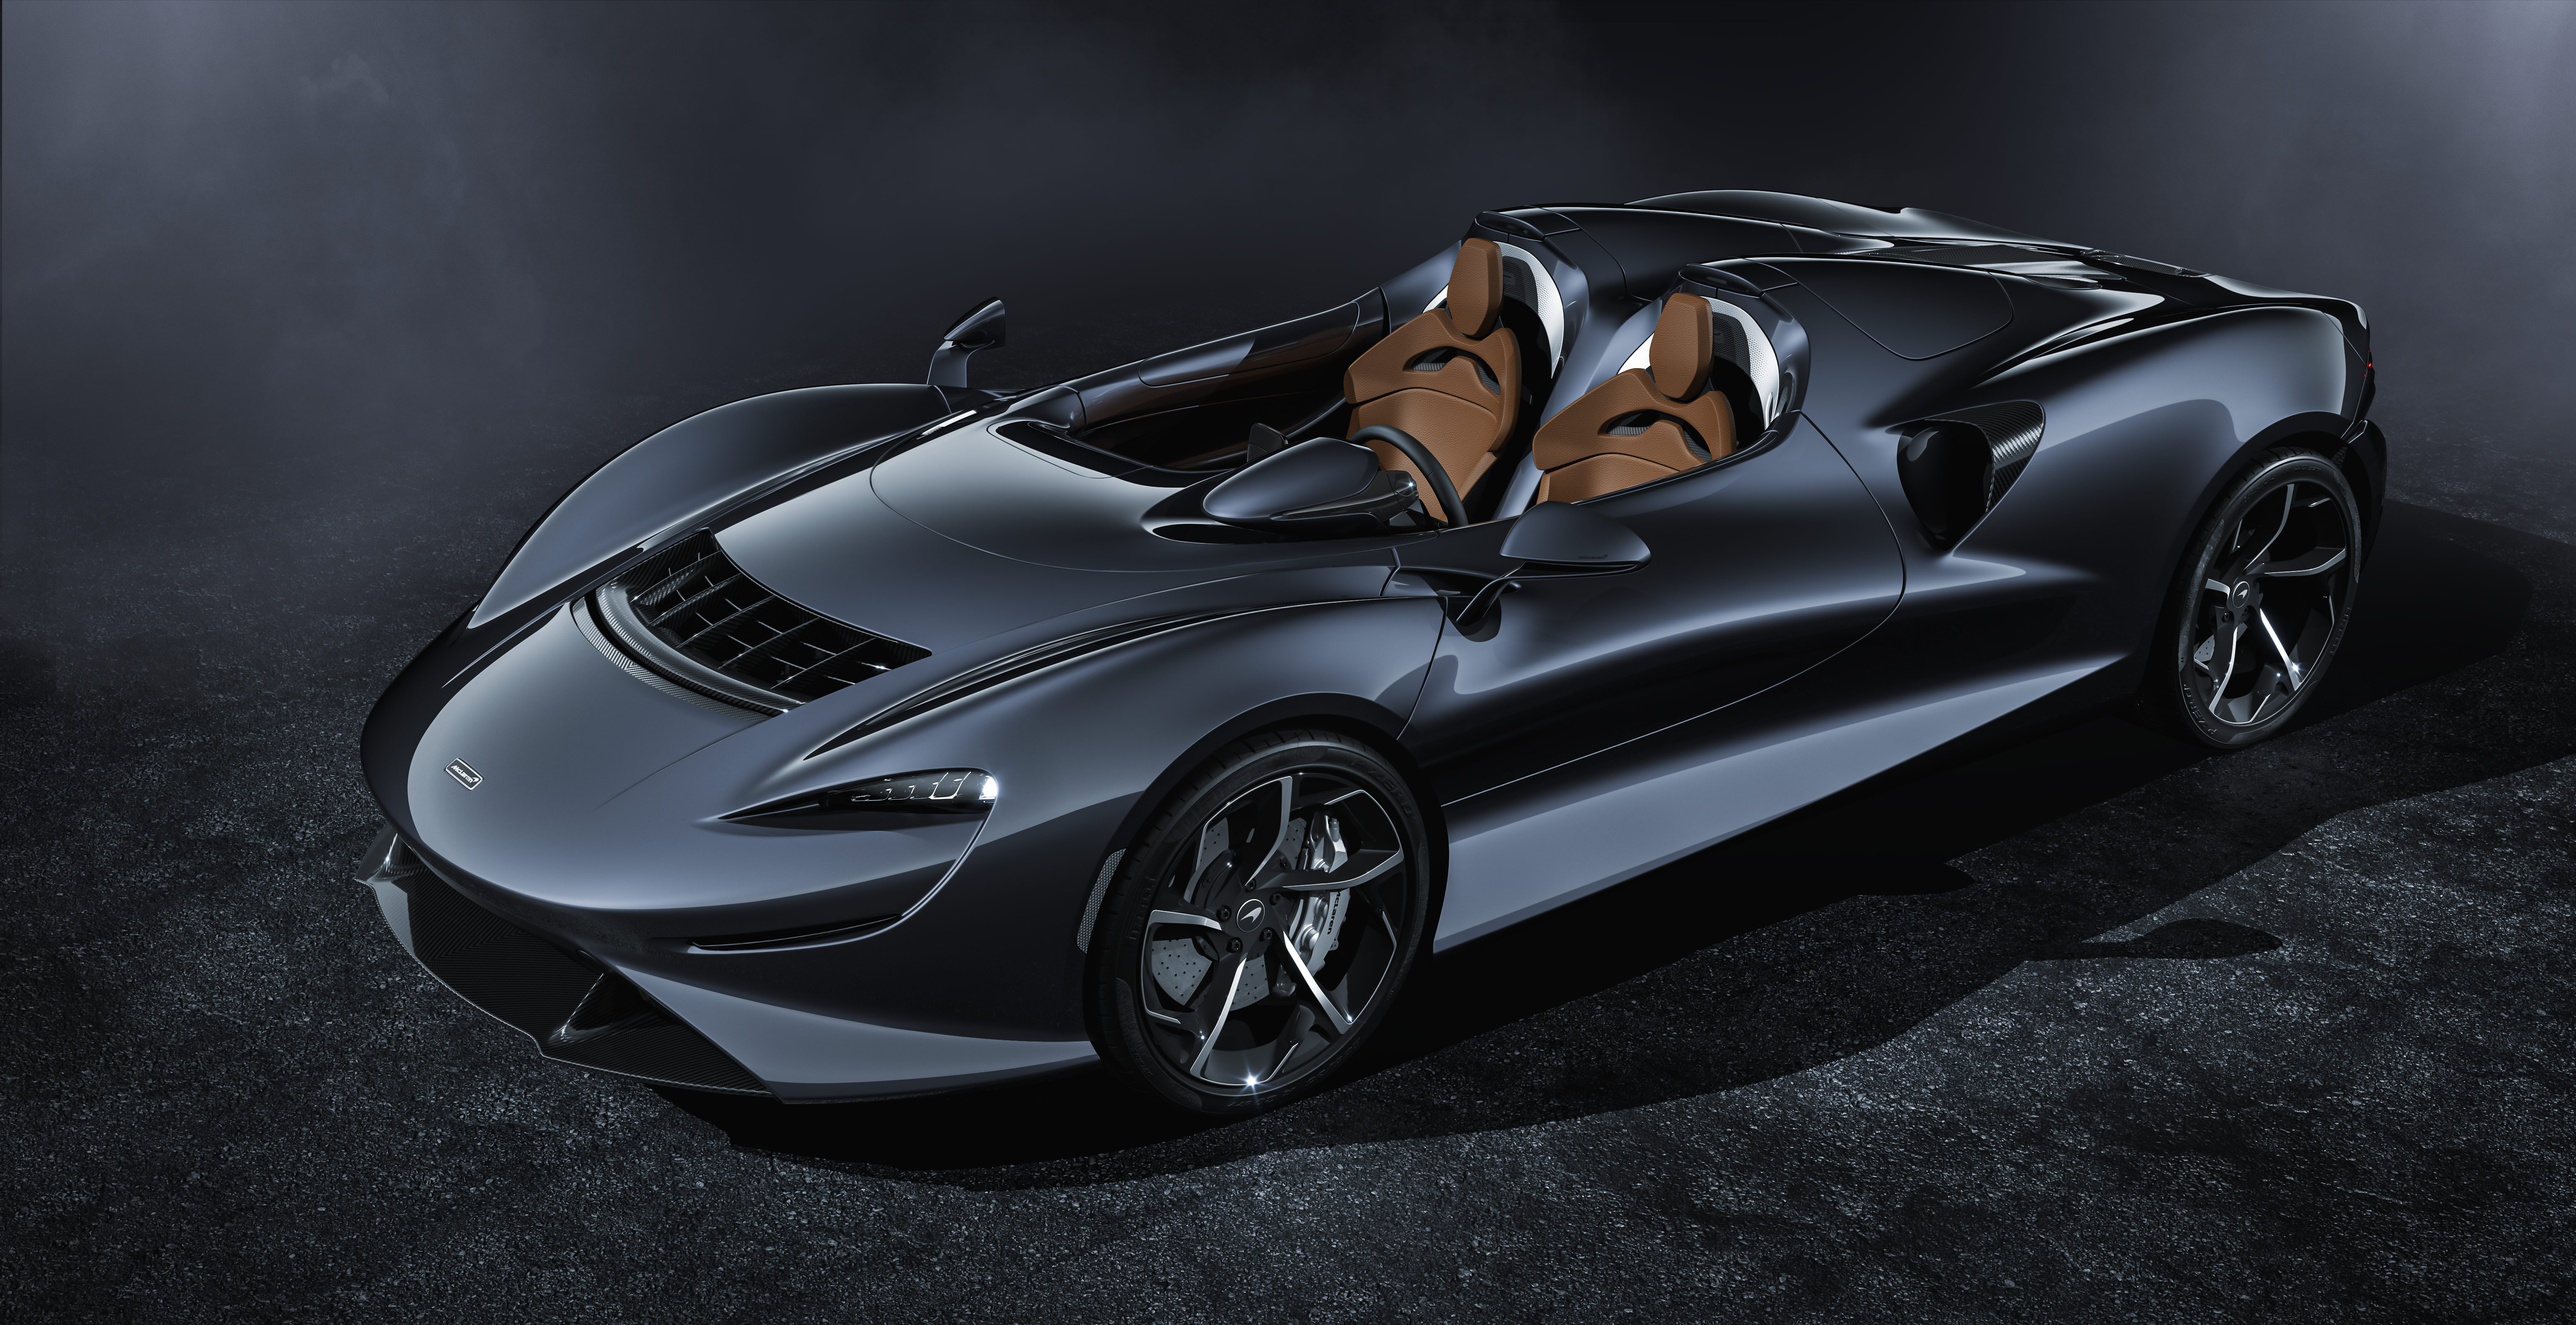 2020 mclaren elva 1577652478 - 2020 McLaren Elva - 2020 McLaren Elva 4k wallpaper